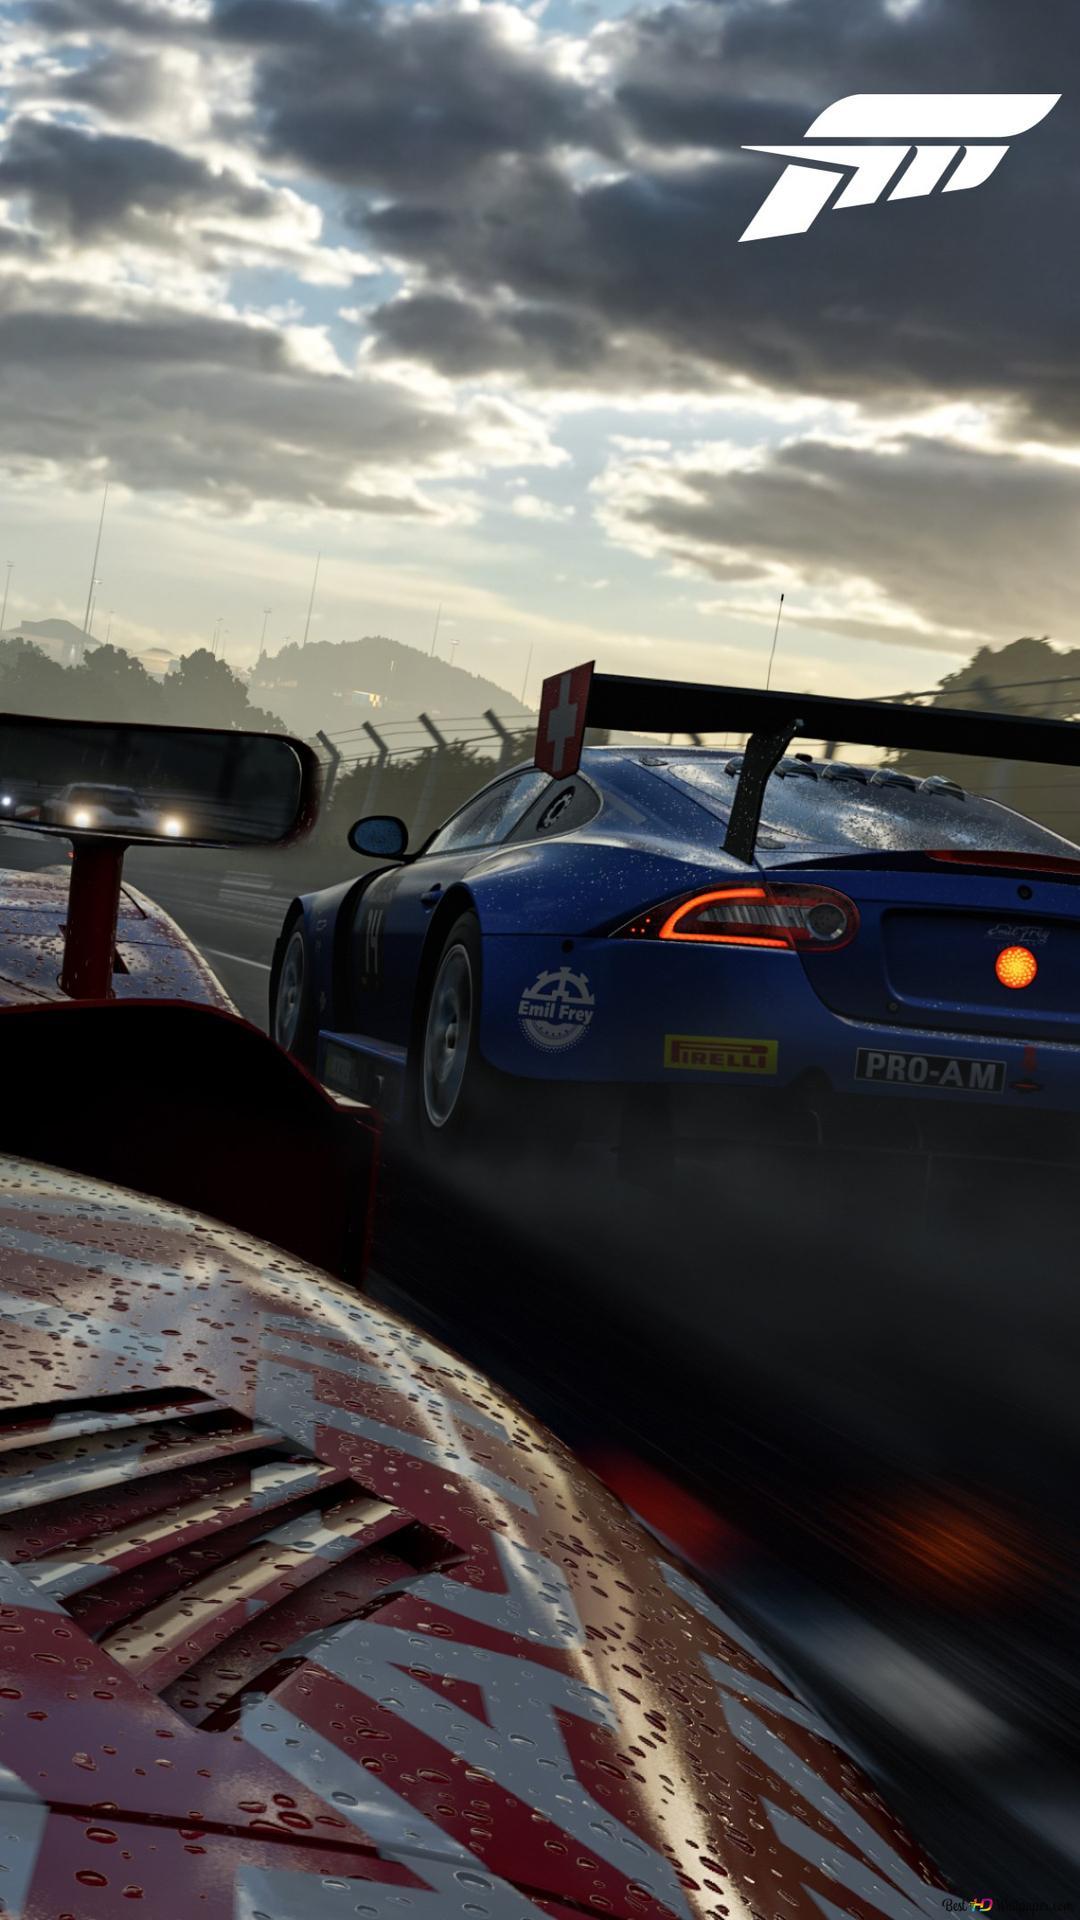 Forza Motorsport 7 Racing Cars Hd Wallpaper Download